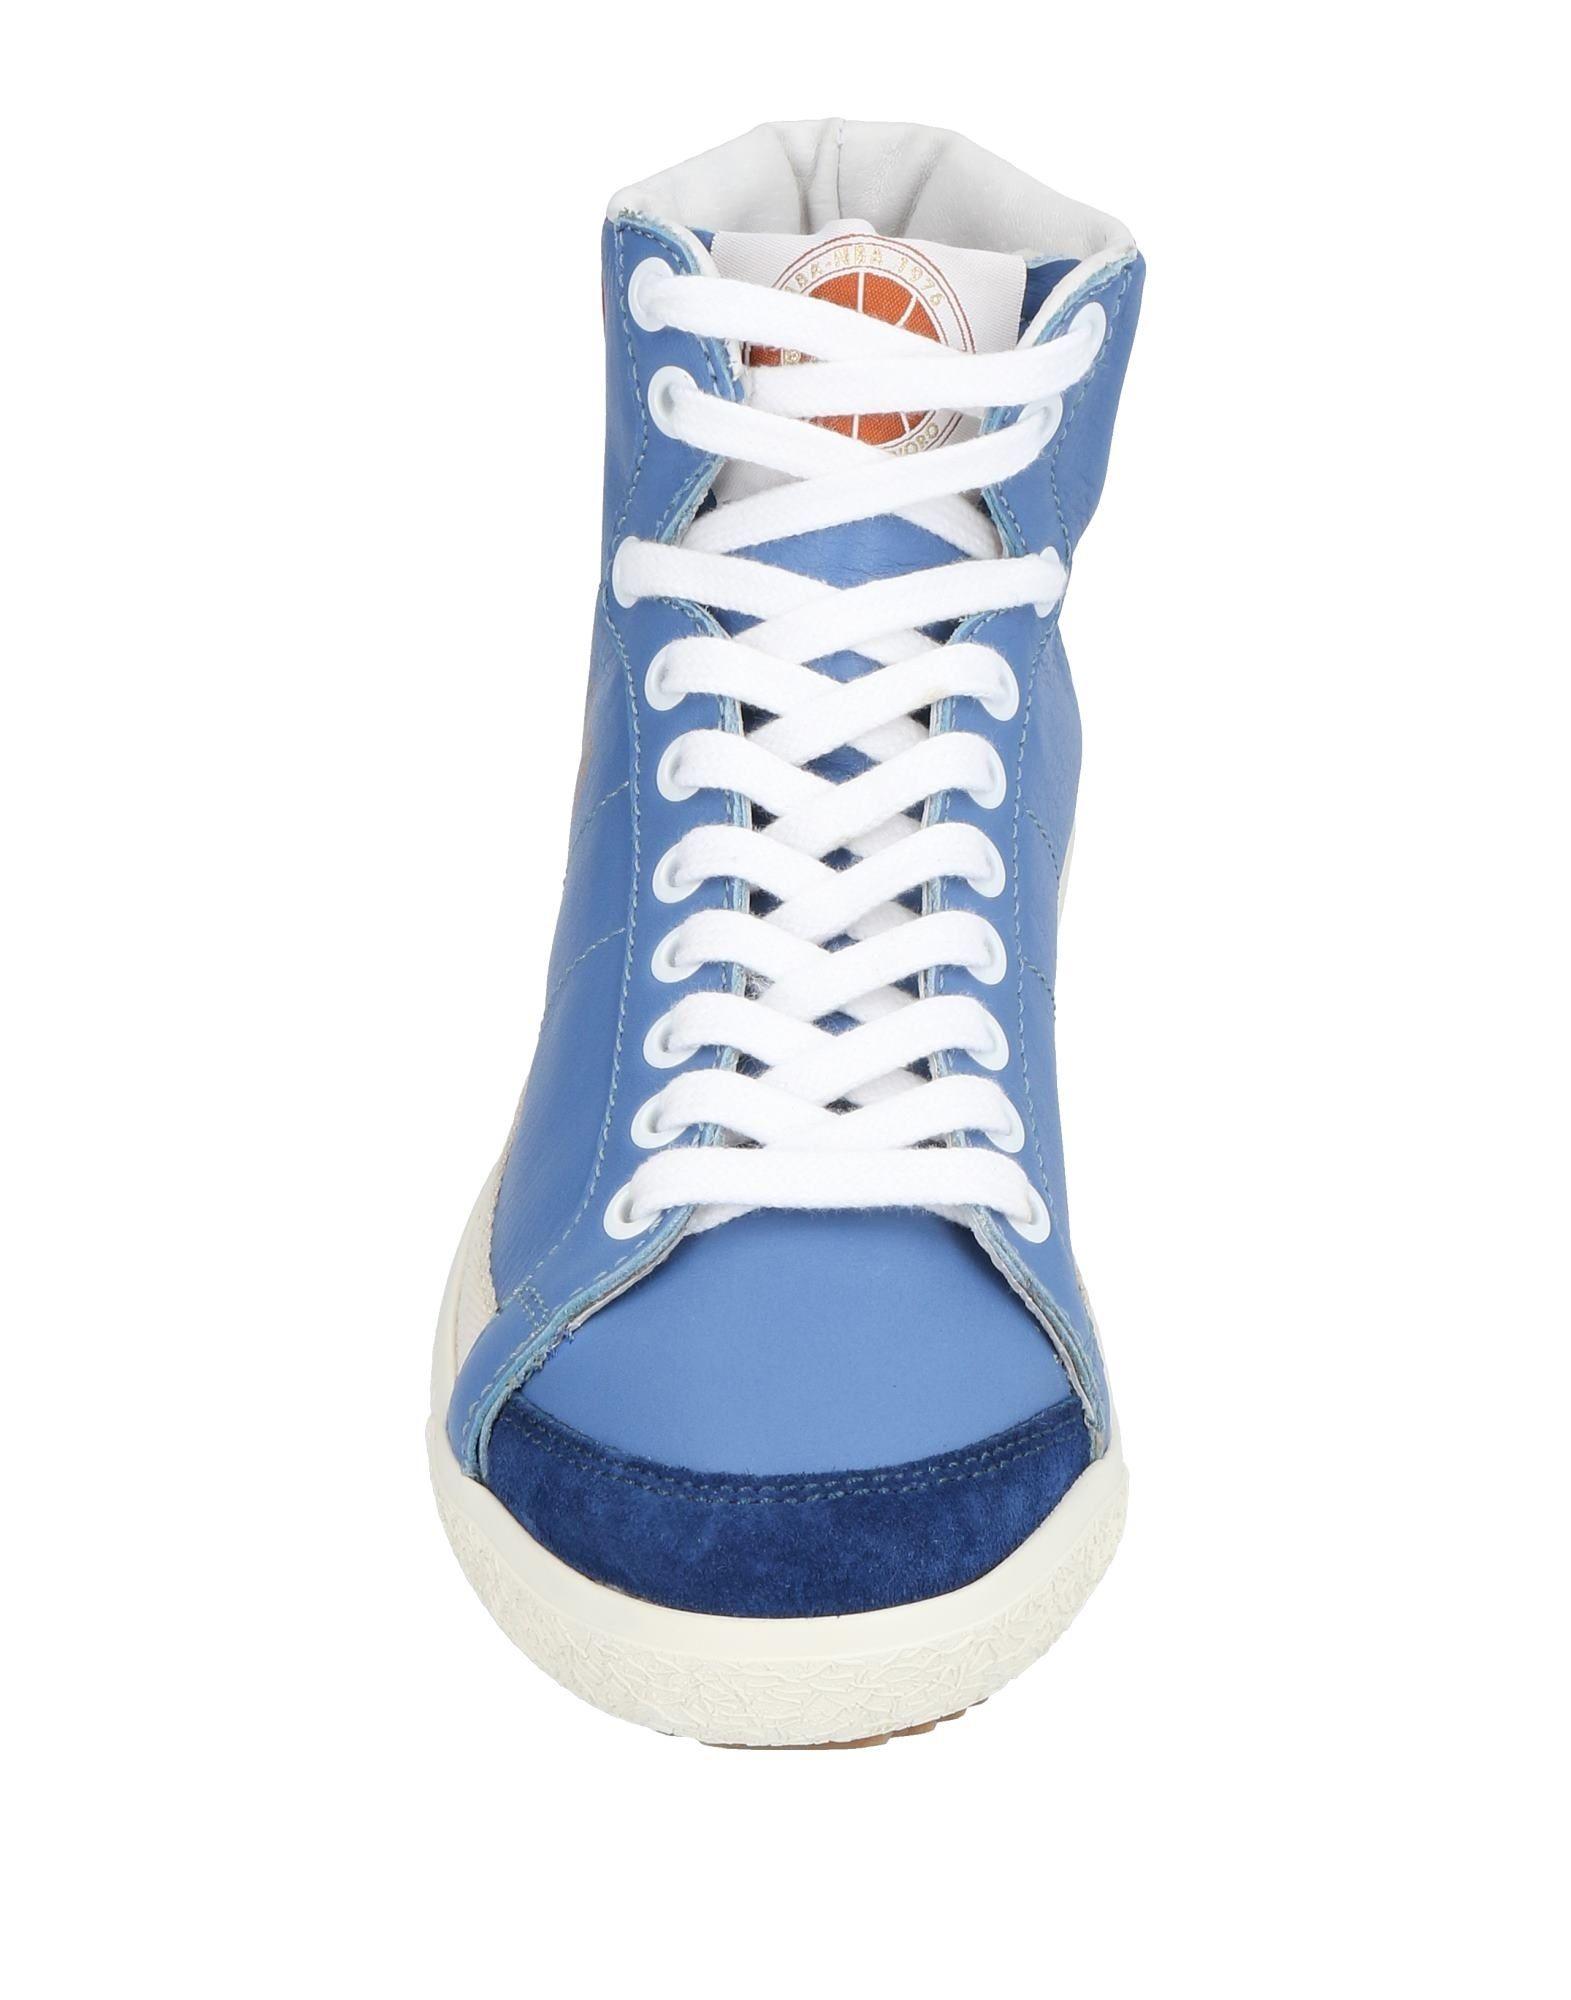 Pantofola D'oro aussehende Sneakers Damen  11456090HWGut aussehende D'oro strapazierfähige Schuhe 0c06ec